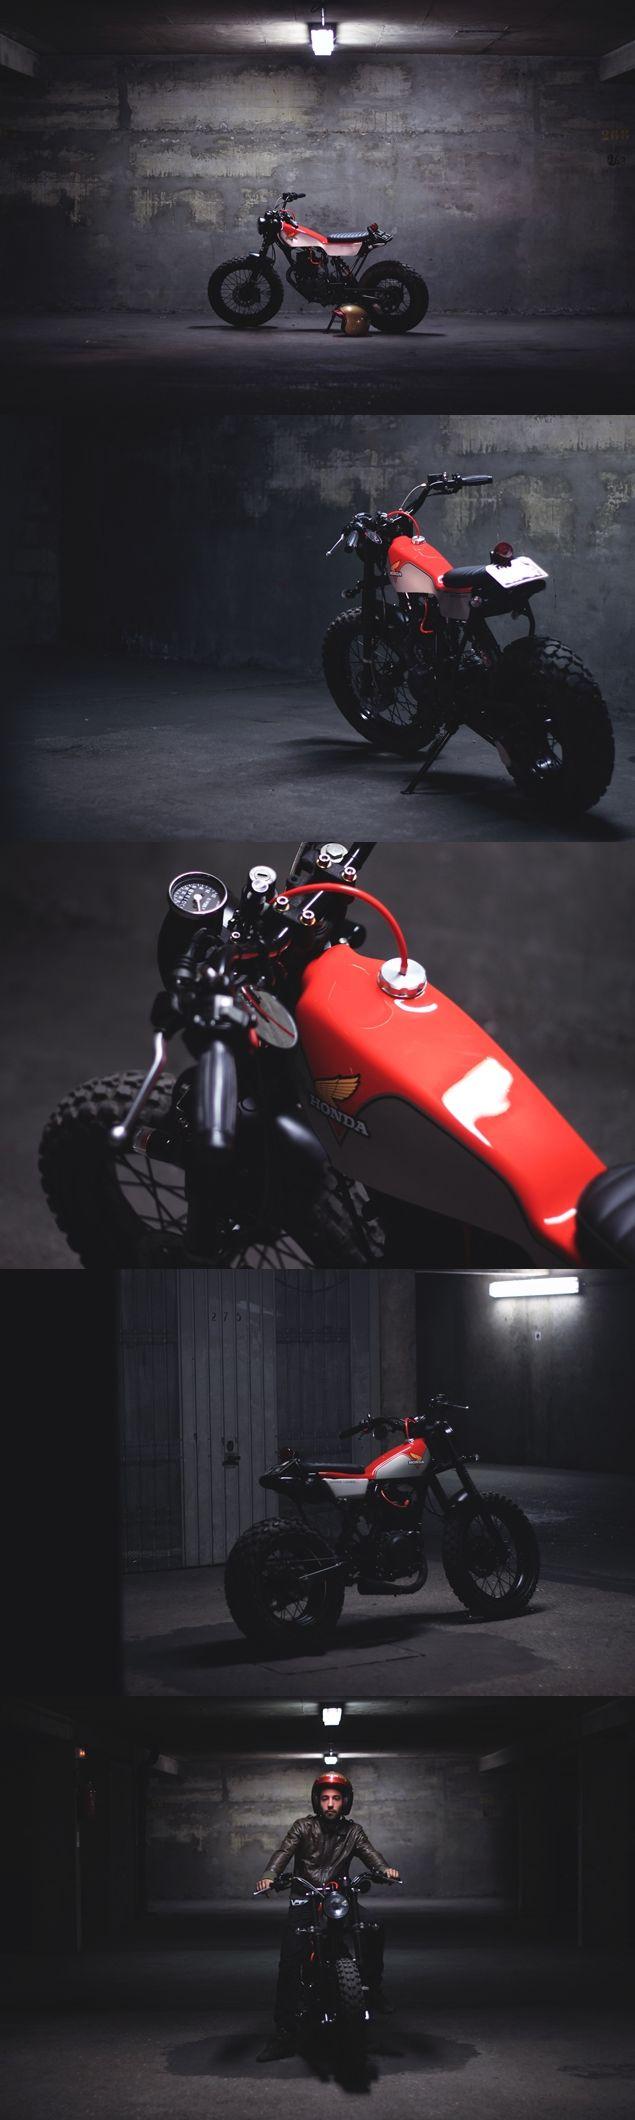 Car amp bike fanatics suzuki m50 bobber bike - 22 Best Moto 125 Images On Pinterest Cafe Racers Custom Bikes And Custom Motorcycles